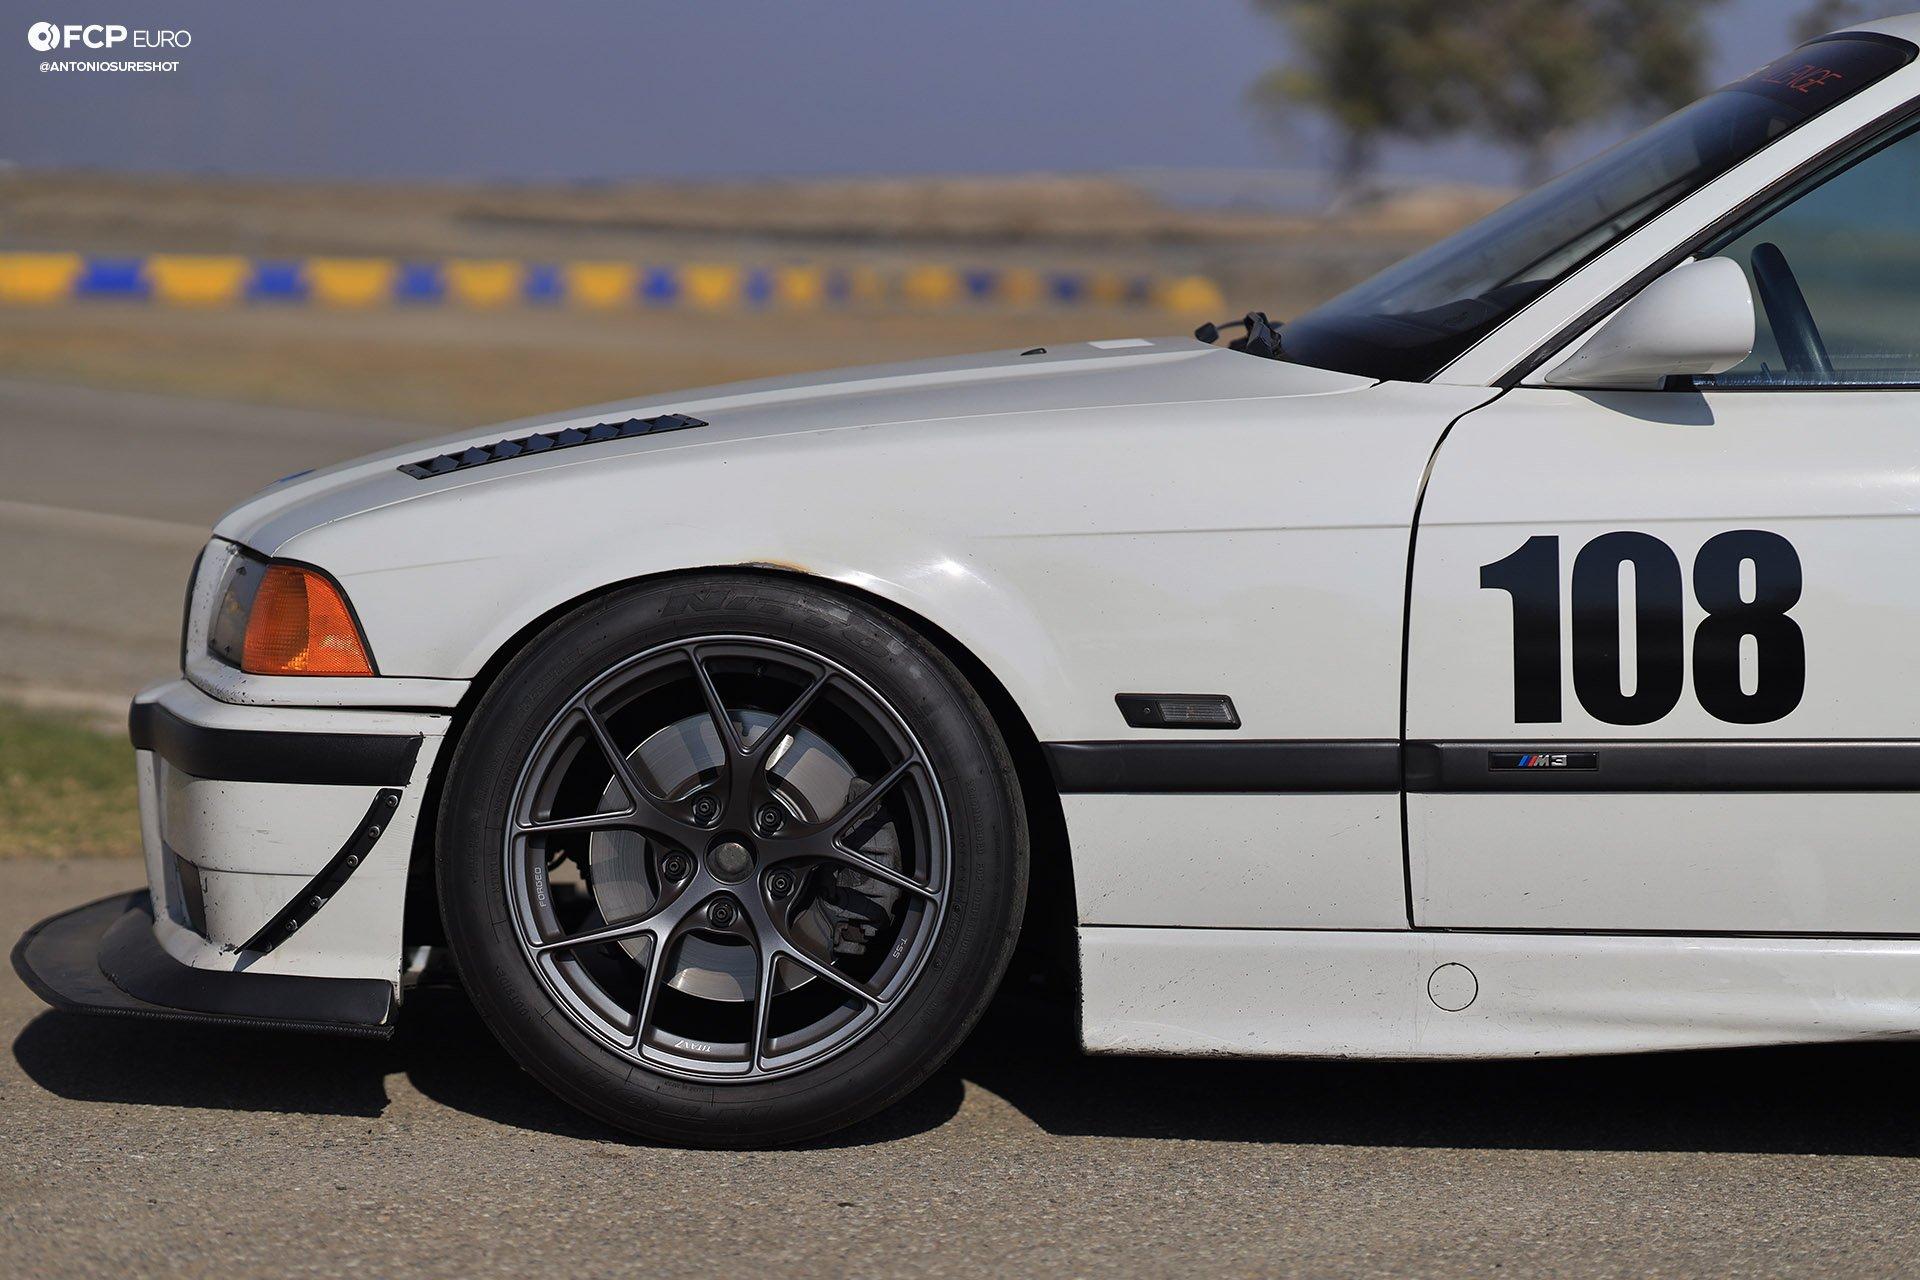 Motorsport Hardware BMW E36 M3 EOSR3560